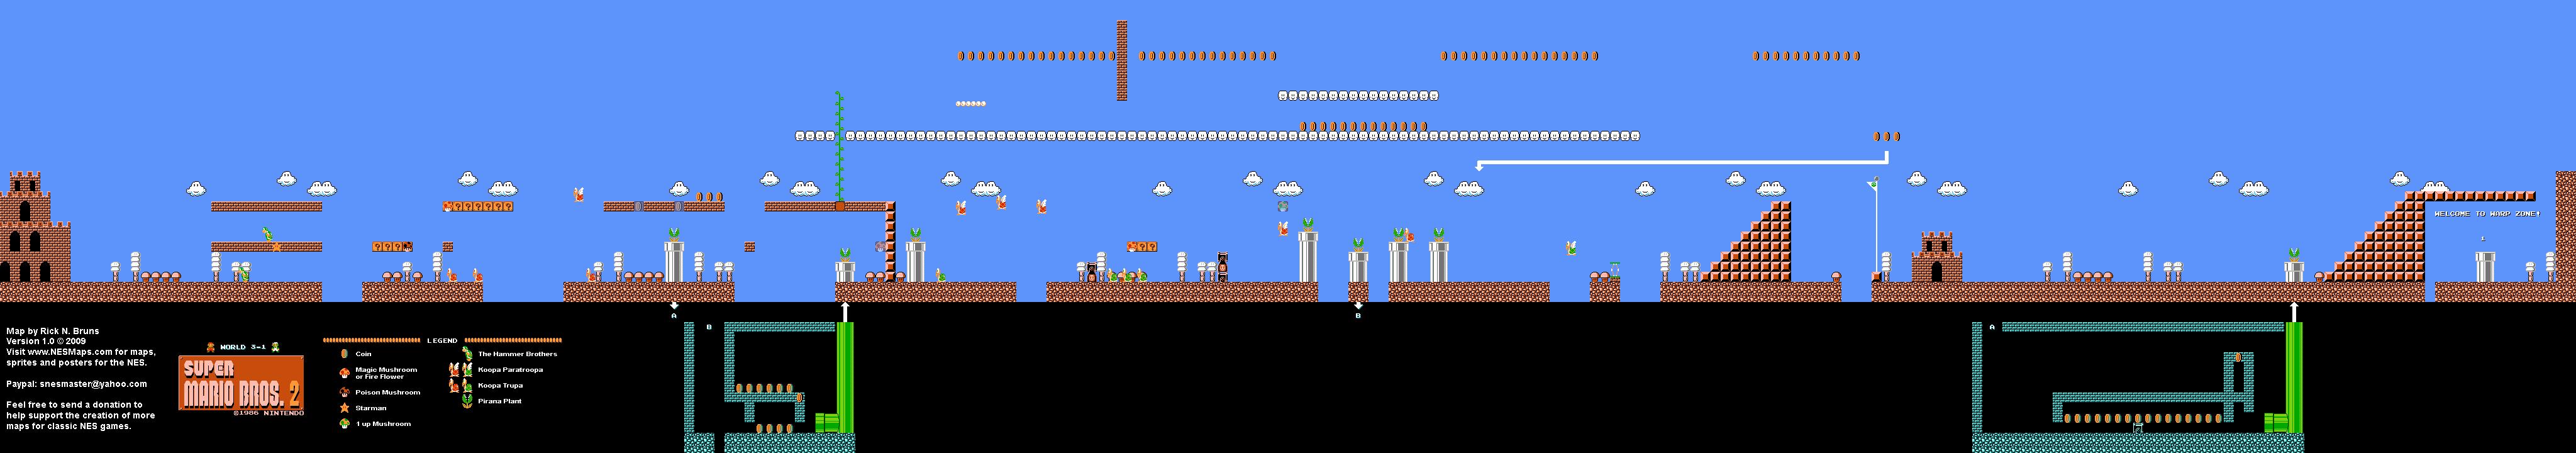 Super Mario Bros 2 Japan The Lost Levels World 3 1 Nintendo Nes Famicom Fds Map